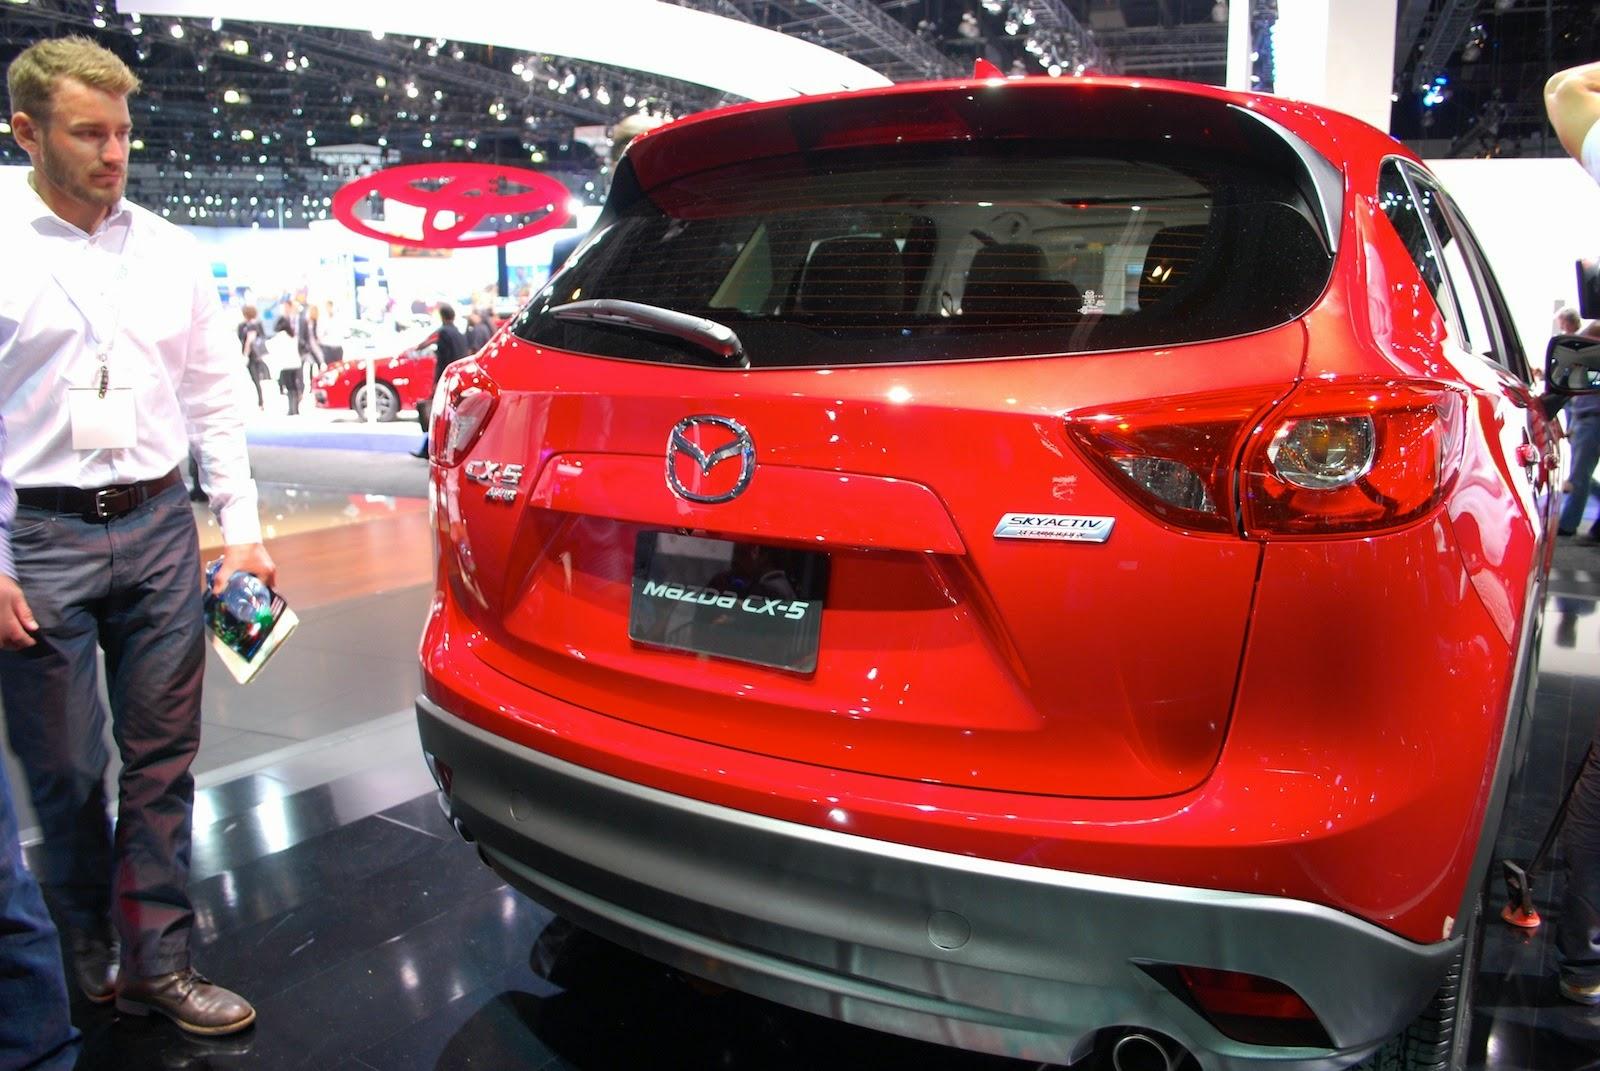 2016 Mazda Cx 5 And Mazda6 Now Have Stylish Interiors They